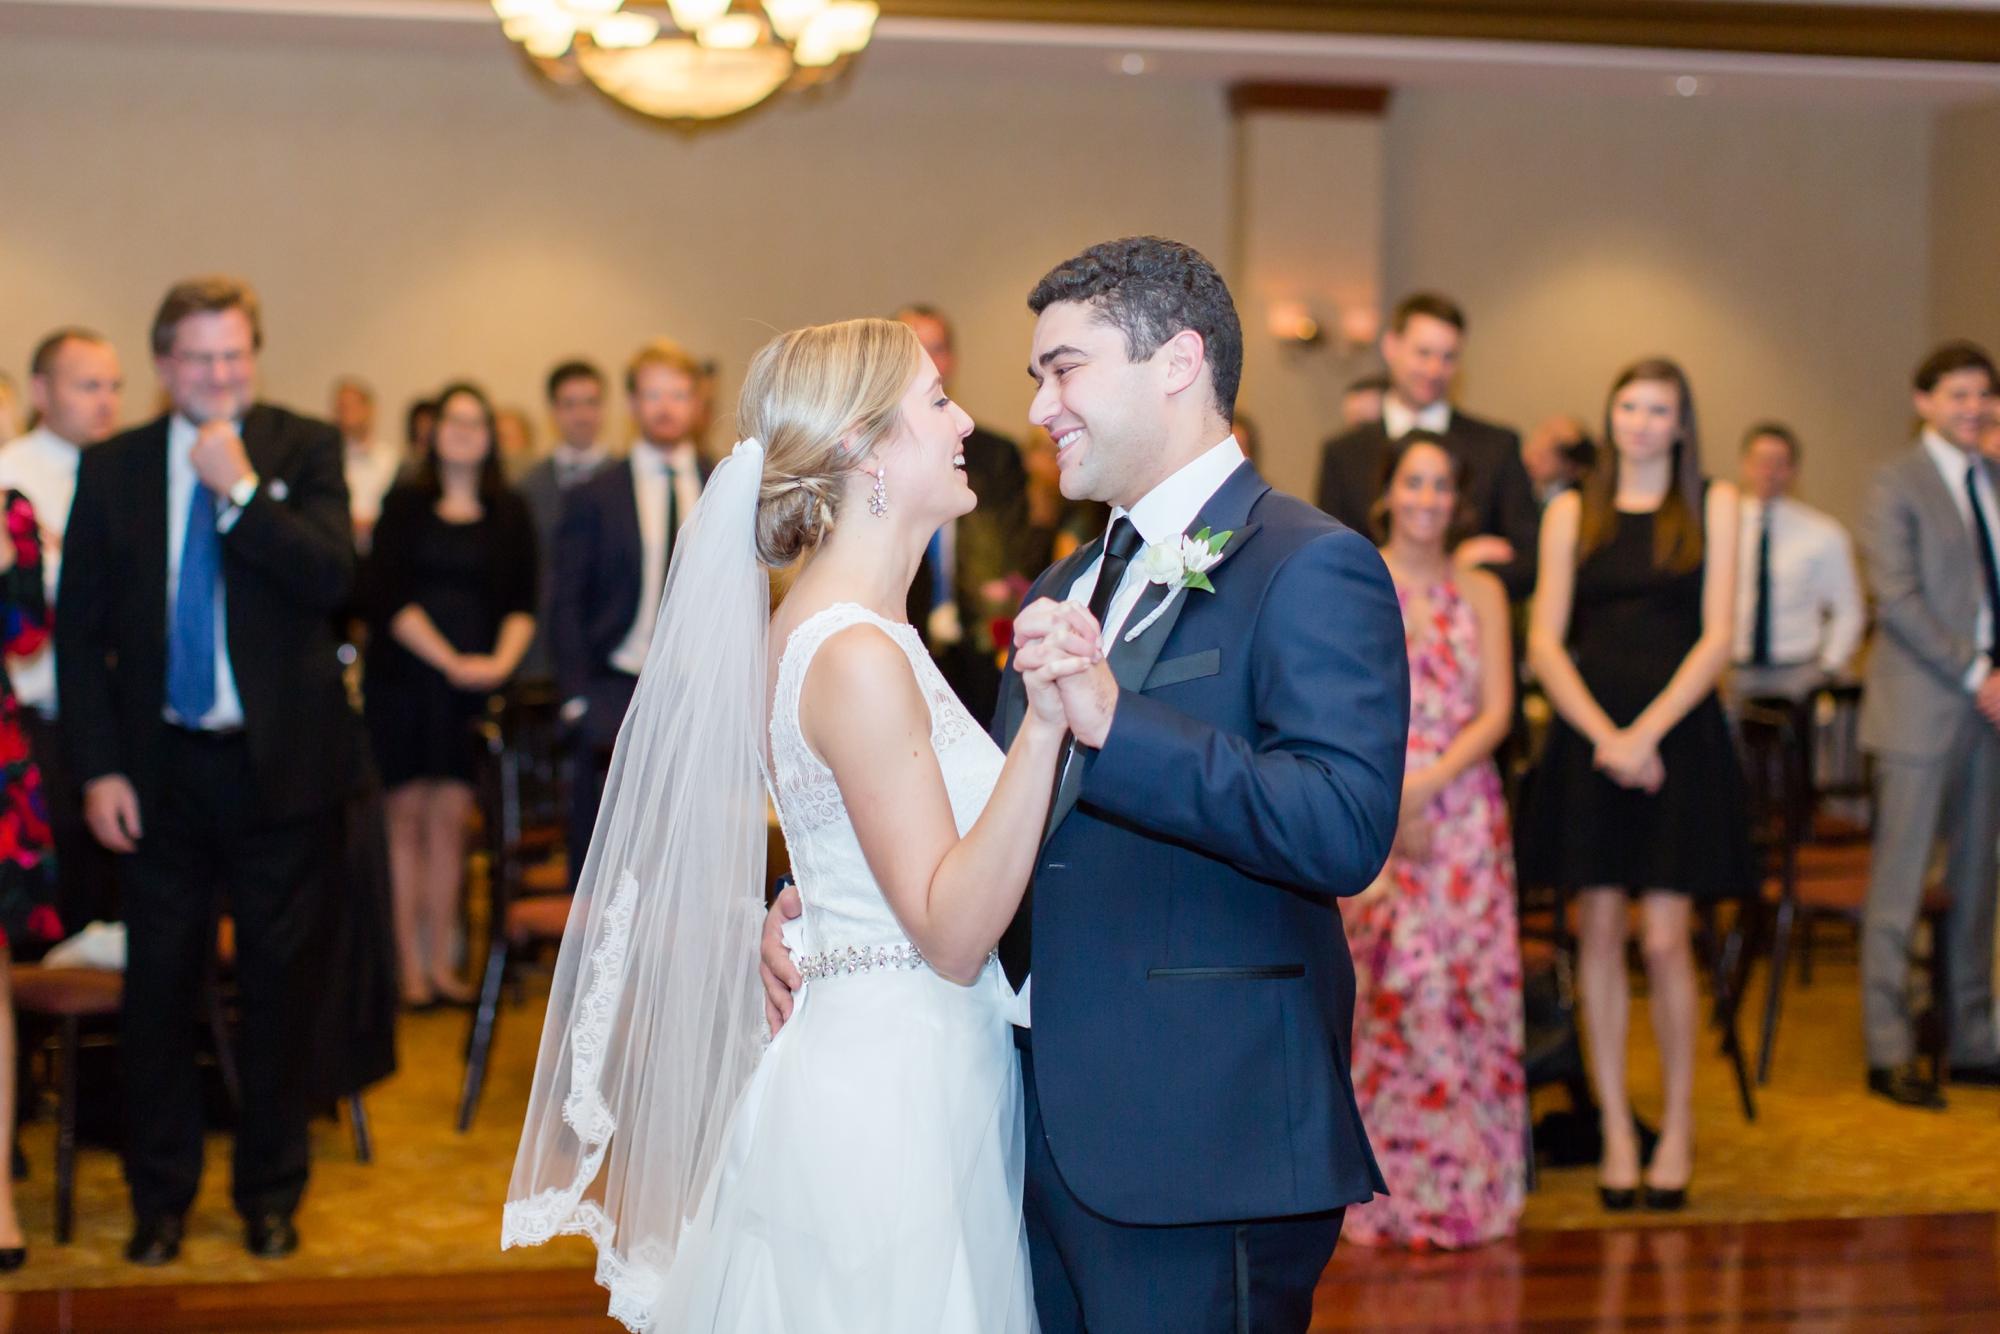 6-Finkel Wedding Reception-775_anna grace photography maryland wedding photographer turf valley.jpg